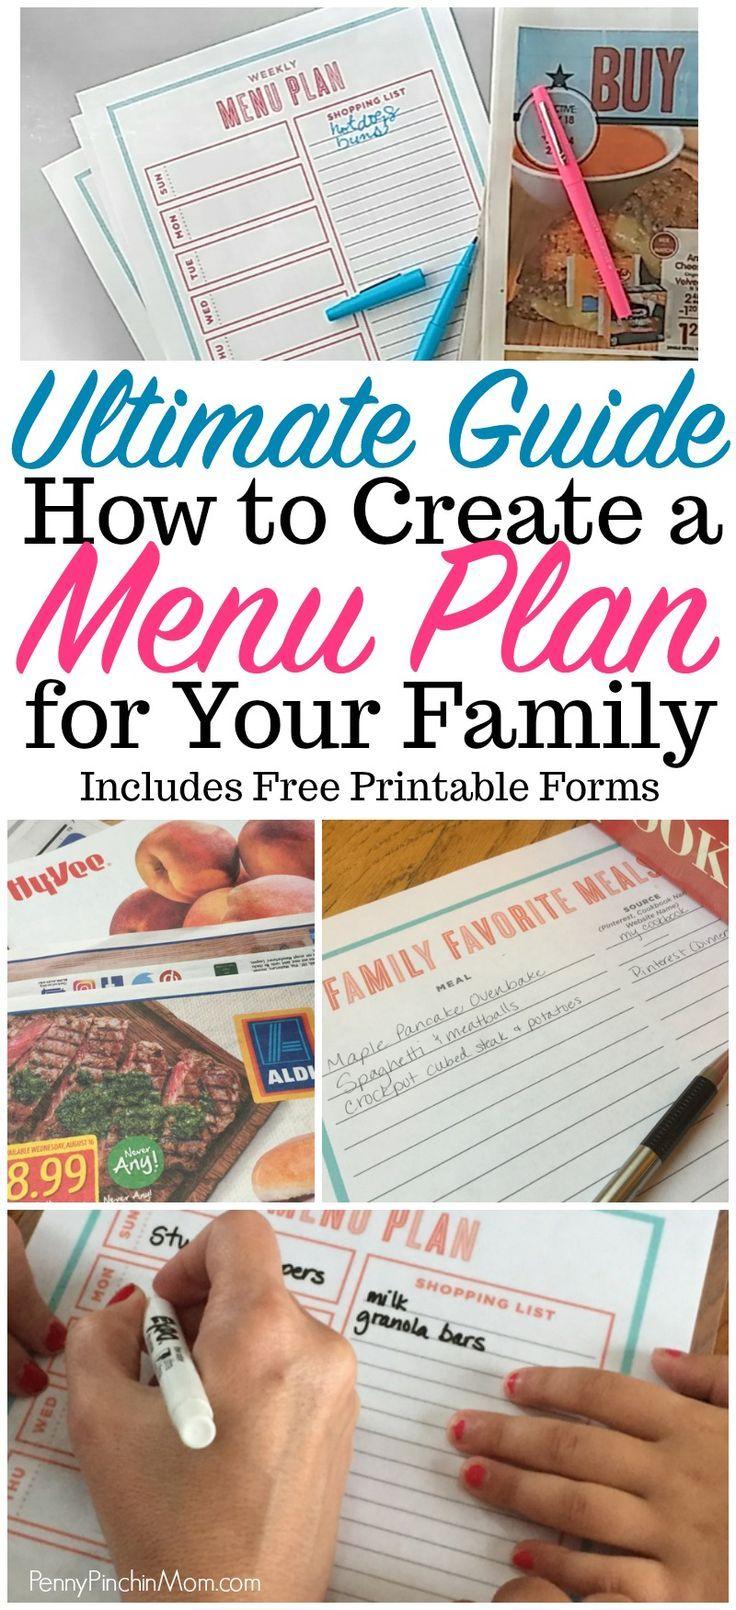 Menu Planning    menu planning printables | menu planner | menu planning on a budget | how to menu plan | menu plan template | menu plan for beginners | menu plan for your family via @PennyPinchinMom